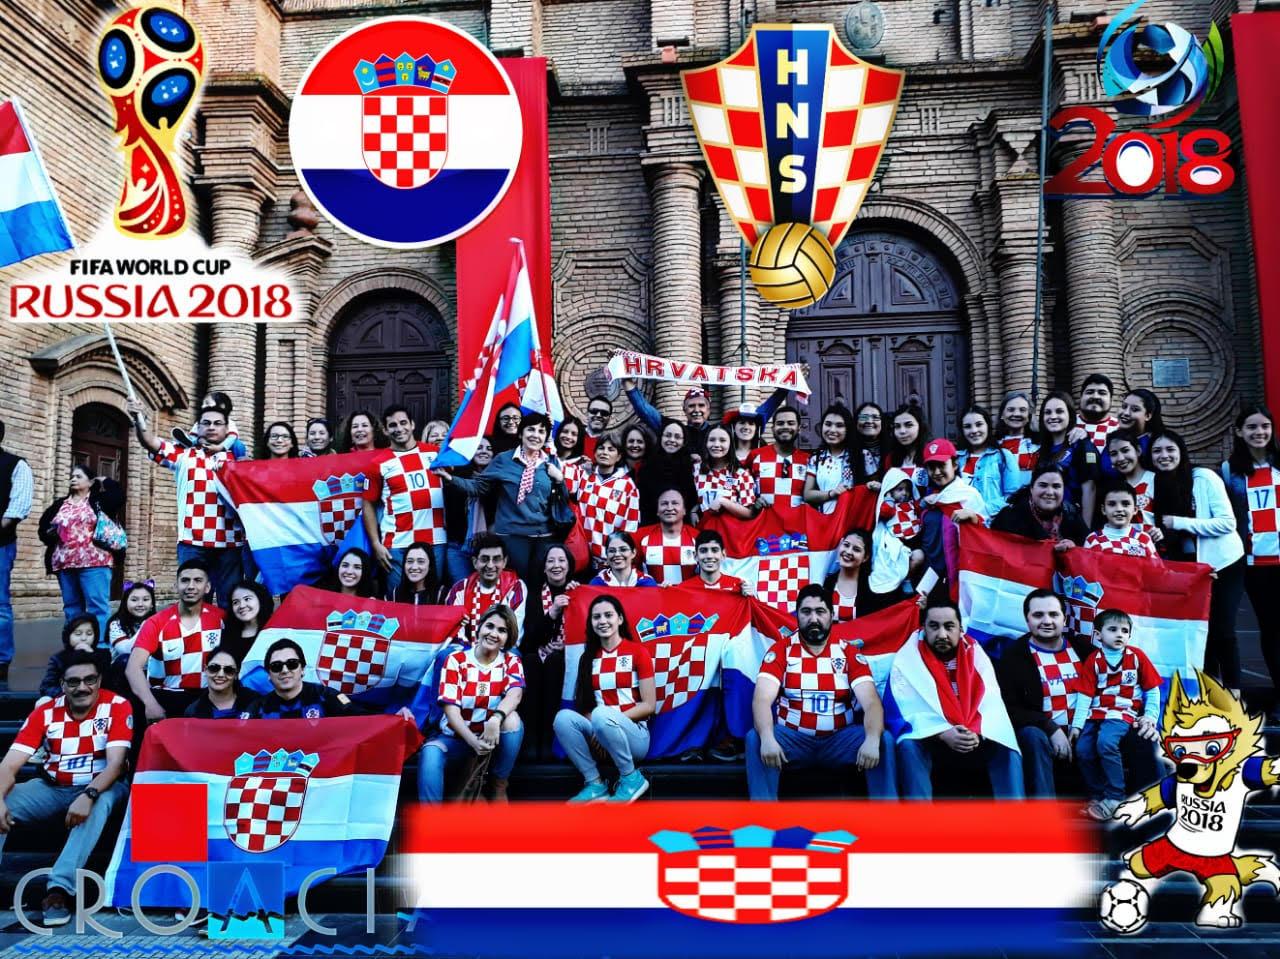 Croatas en Santa Cruz